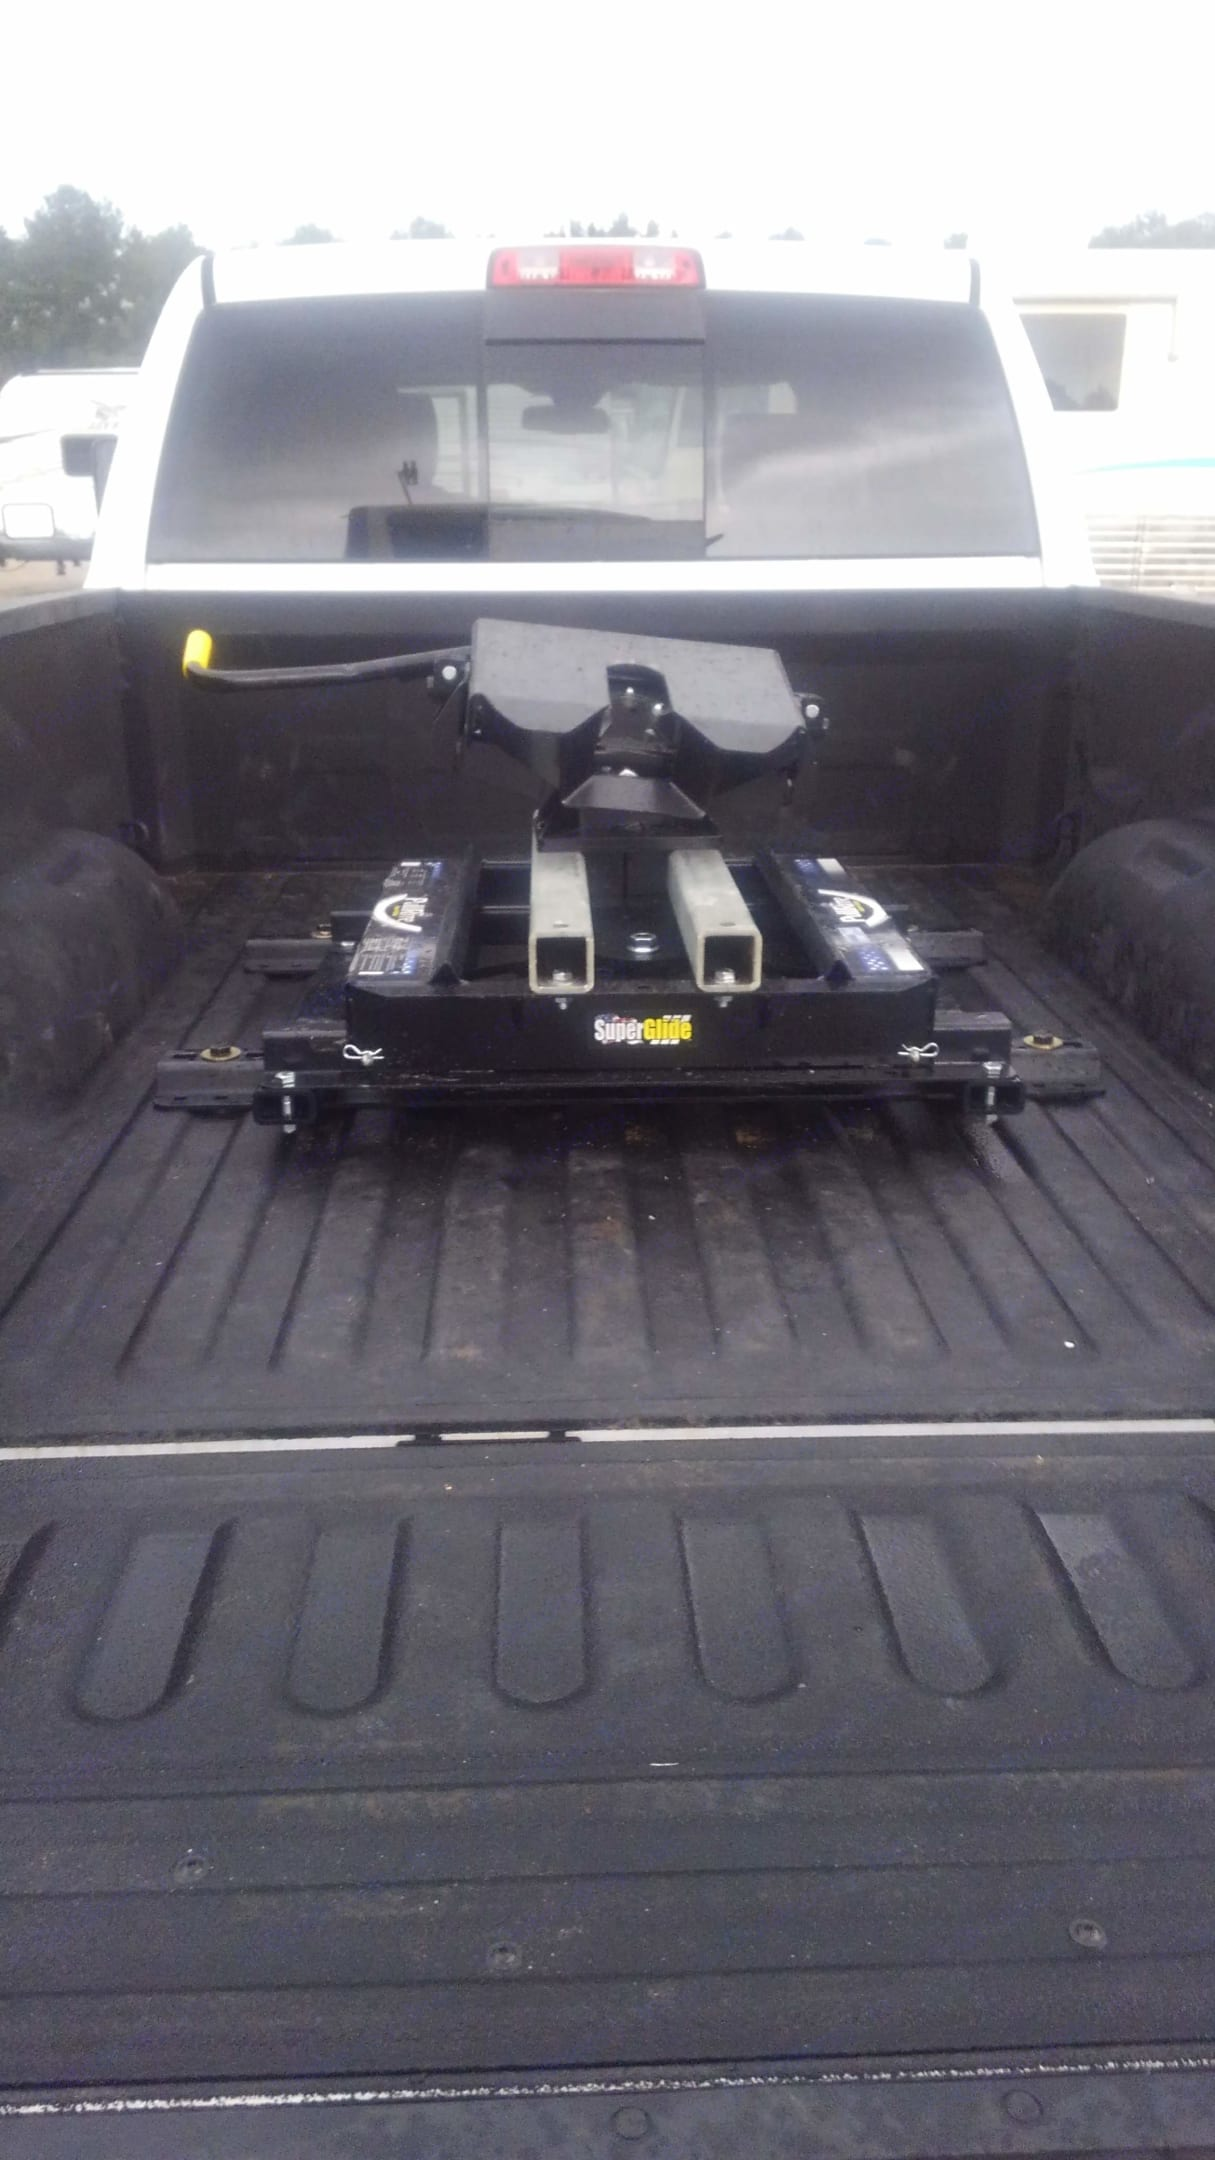 Pull-rite 5th wheel hitch. Ram 3500 2012